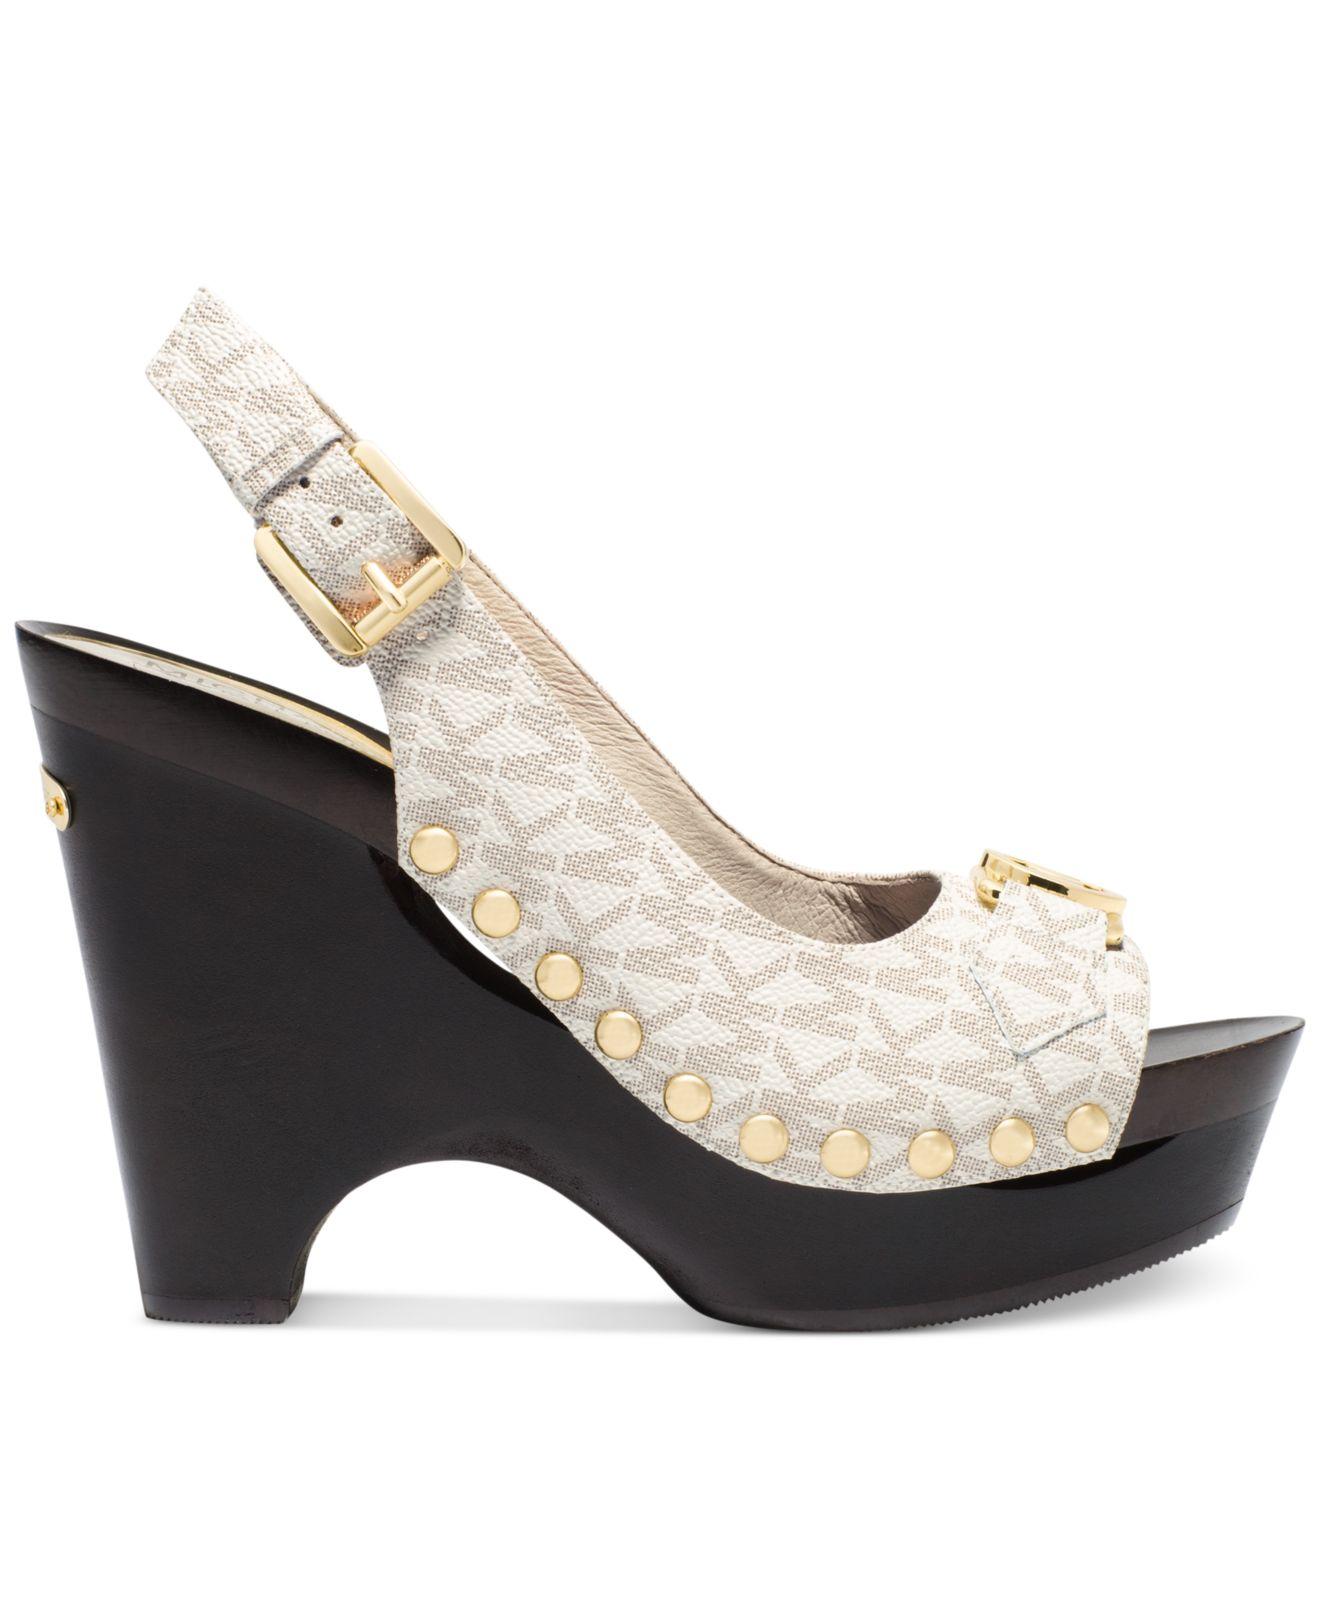 Michael Kors Shoes Womens Sandals